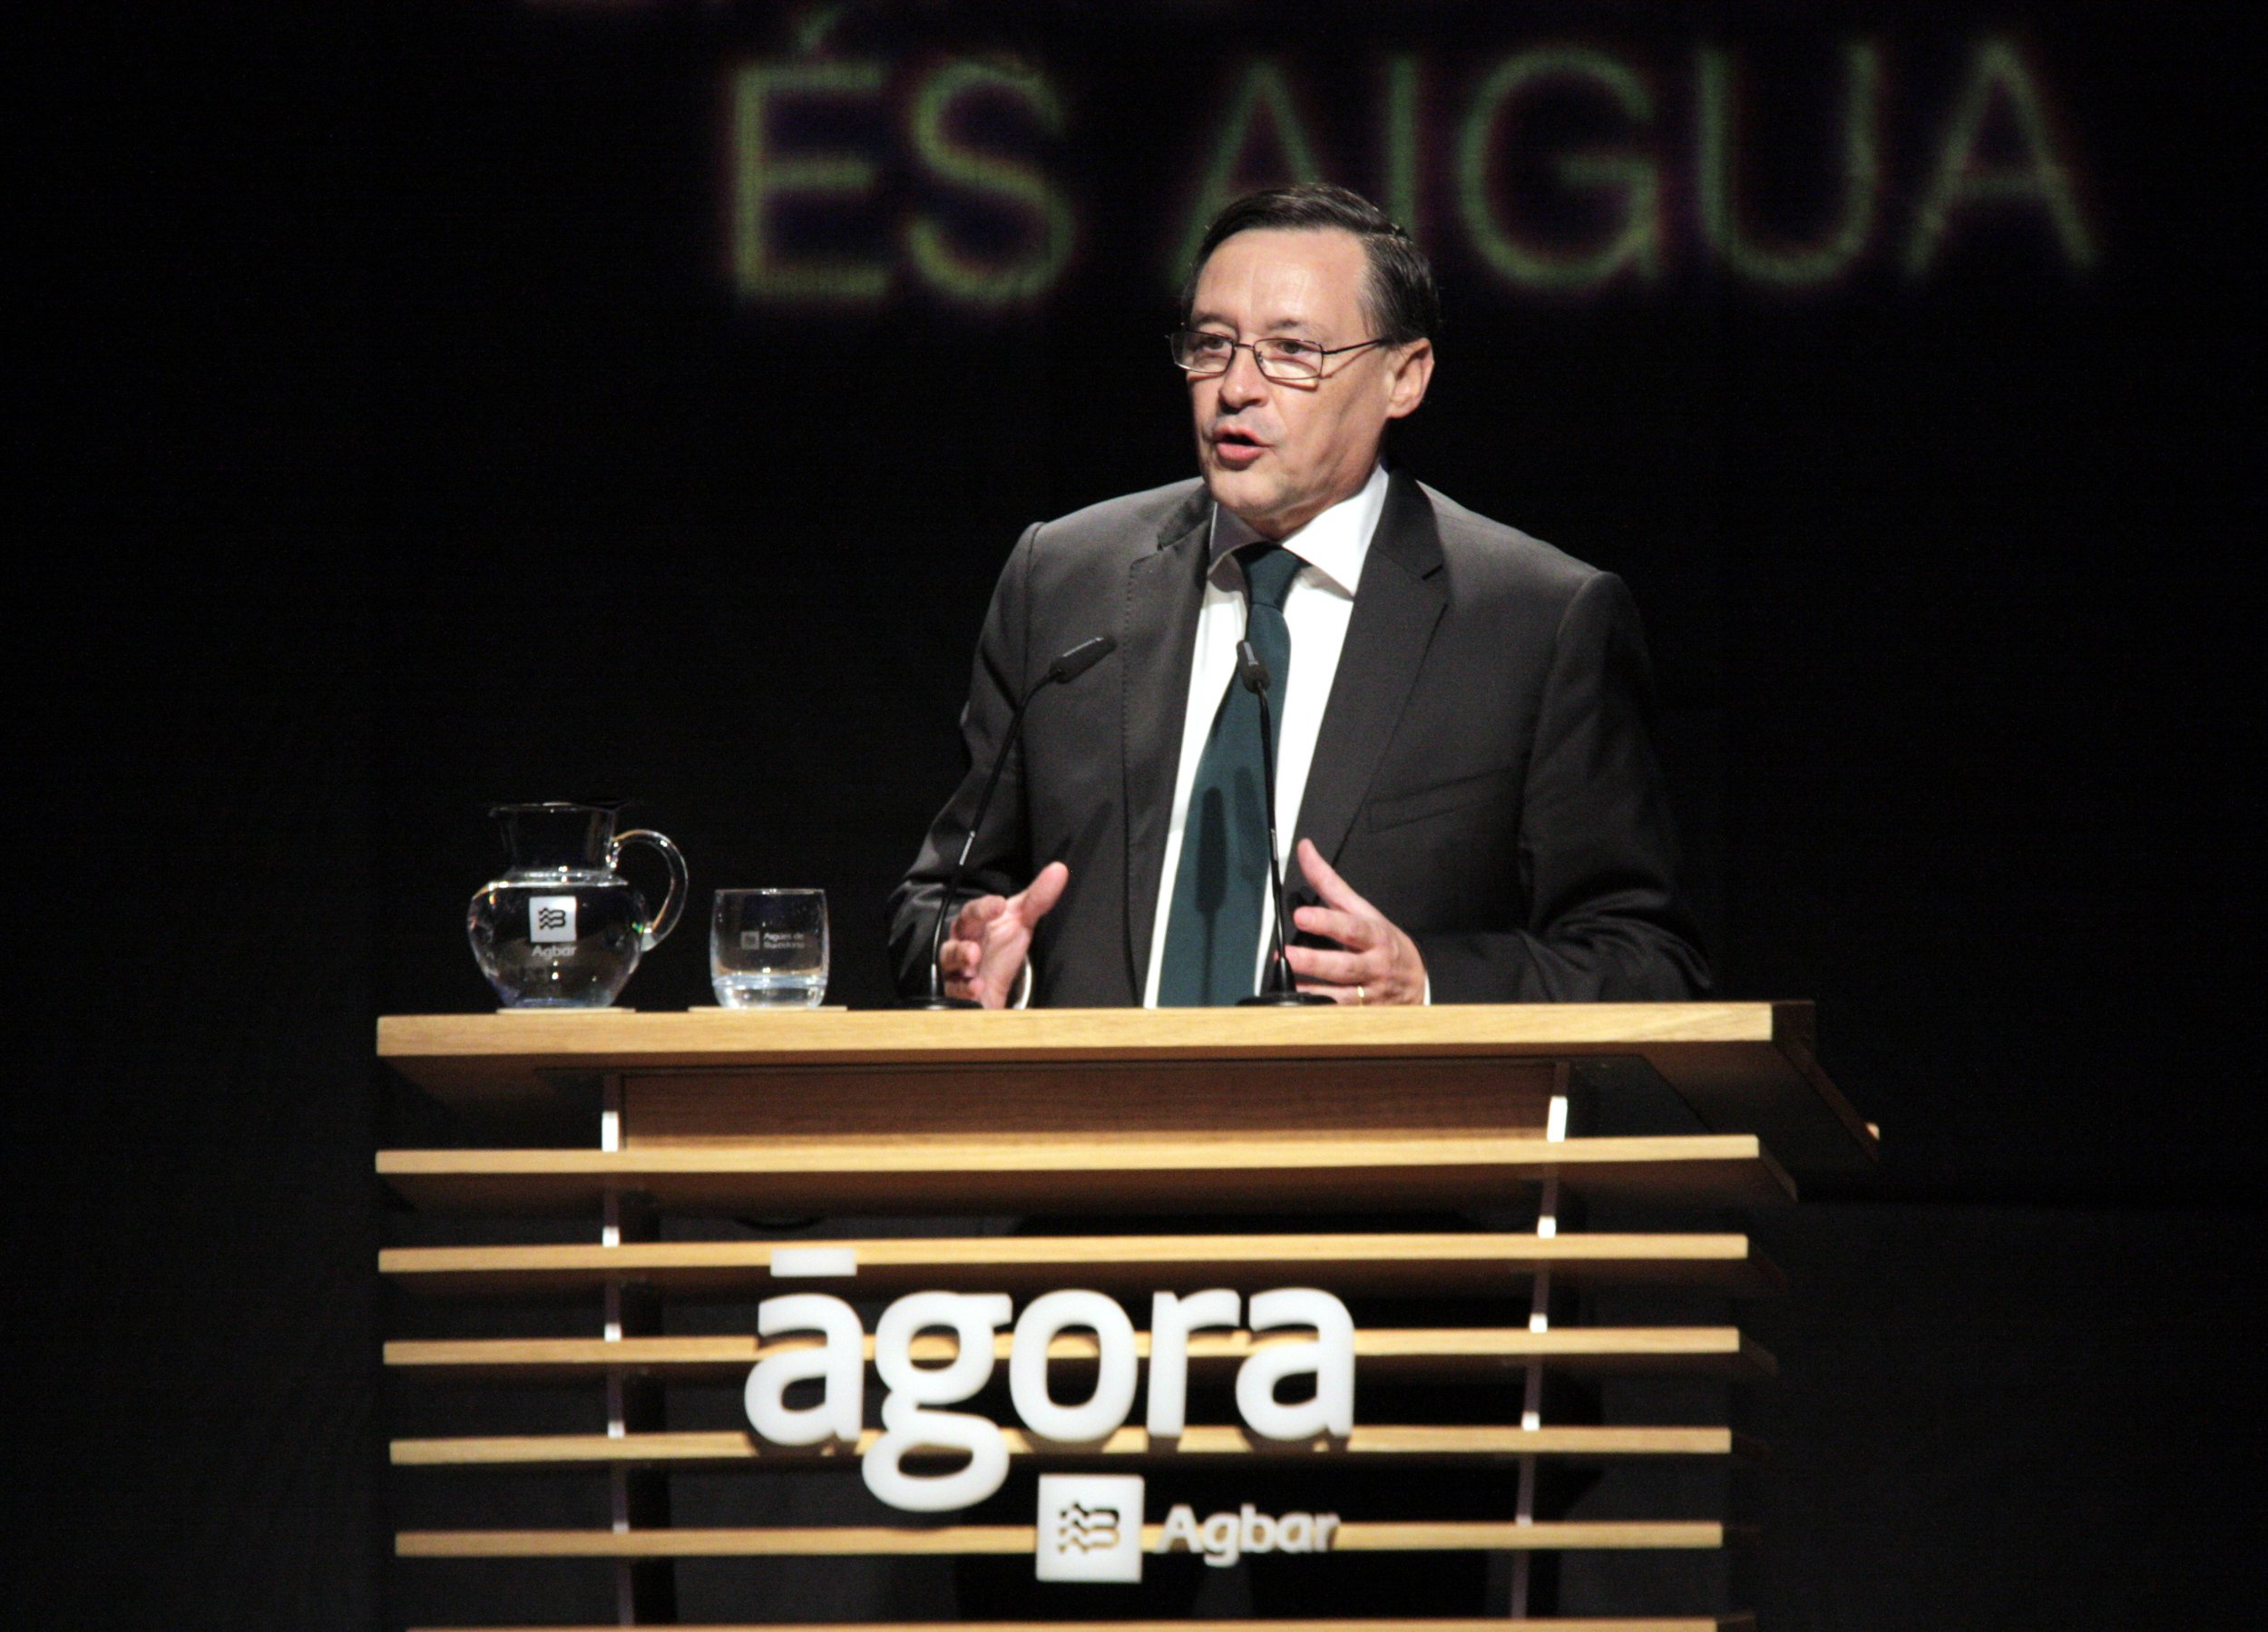 Angel simon president executiu Agbar ACN